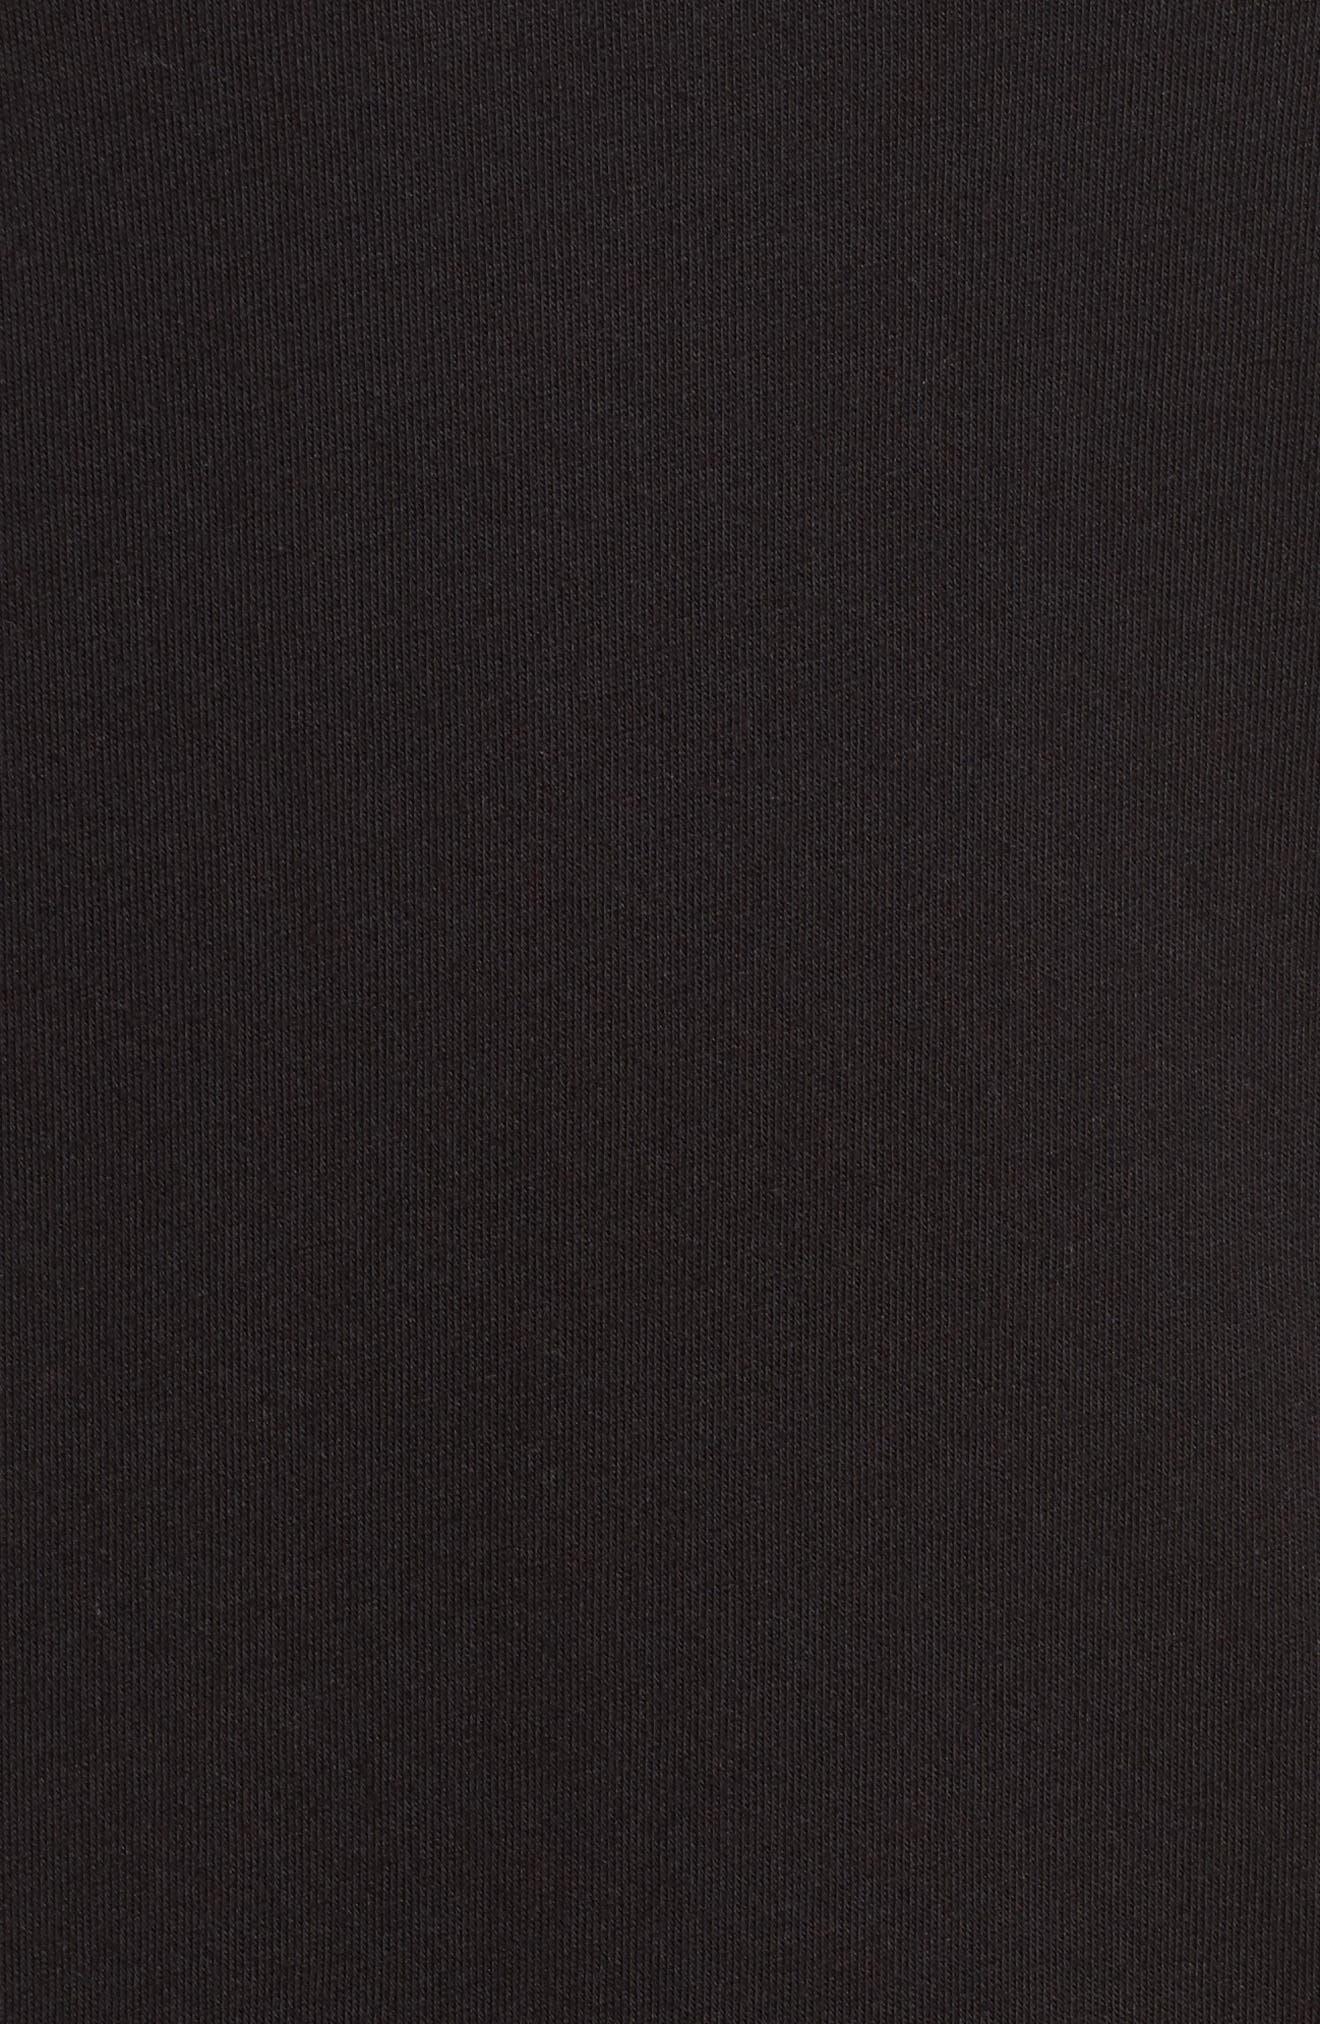 Poplin Sleeve Knit Dress,                             Alternate thumbnail 5, color,                             001